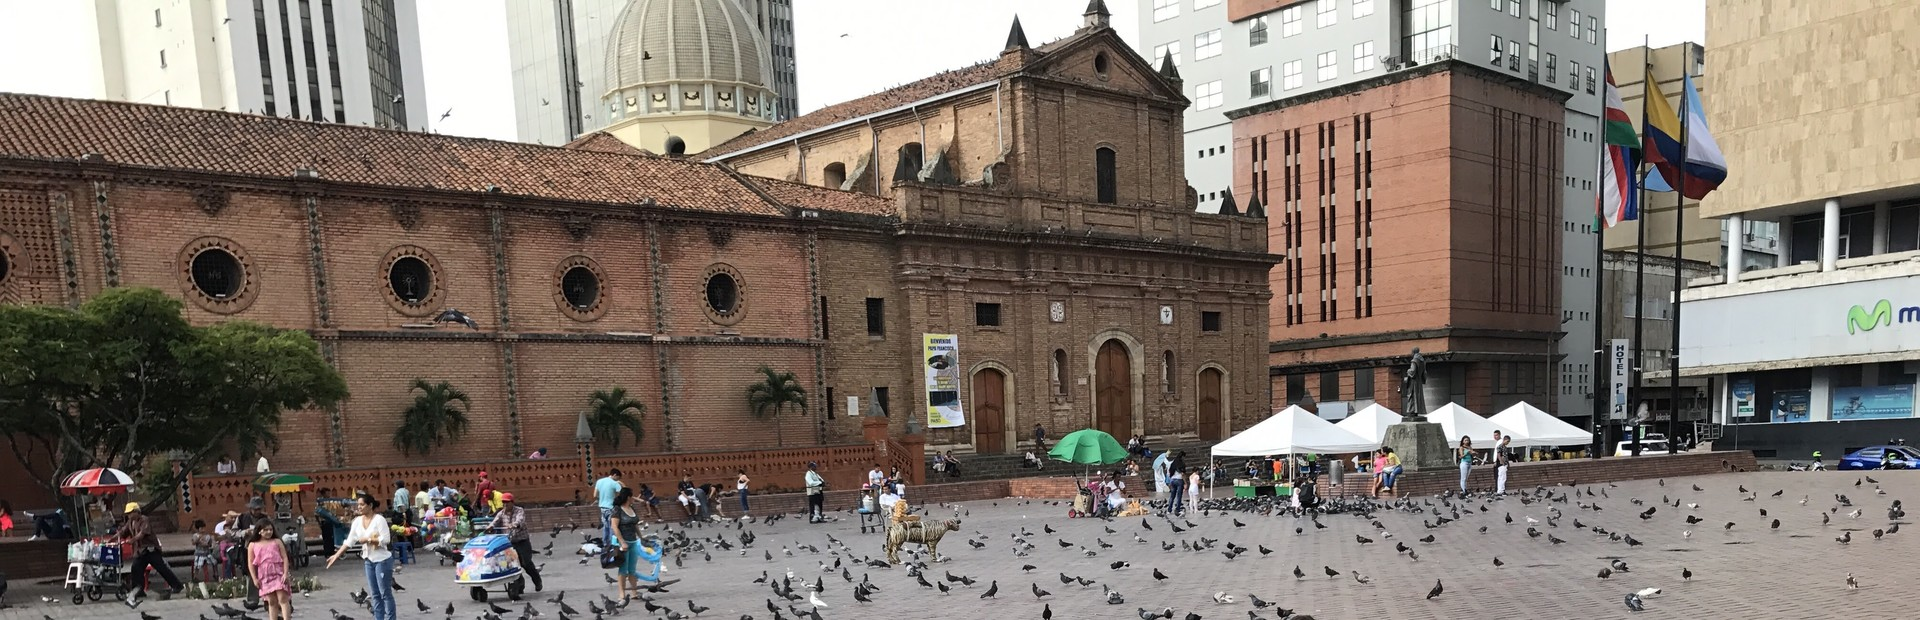 santiago-cali-5731623d205bab0a90ee8c1b09